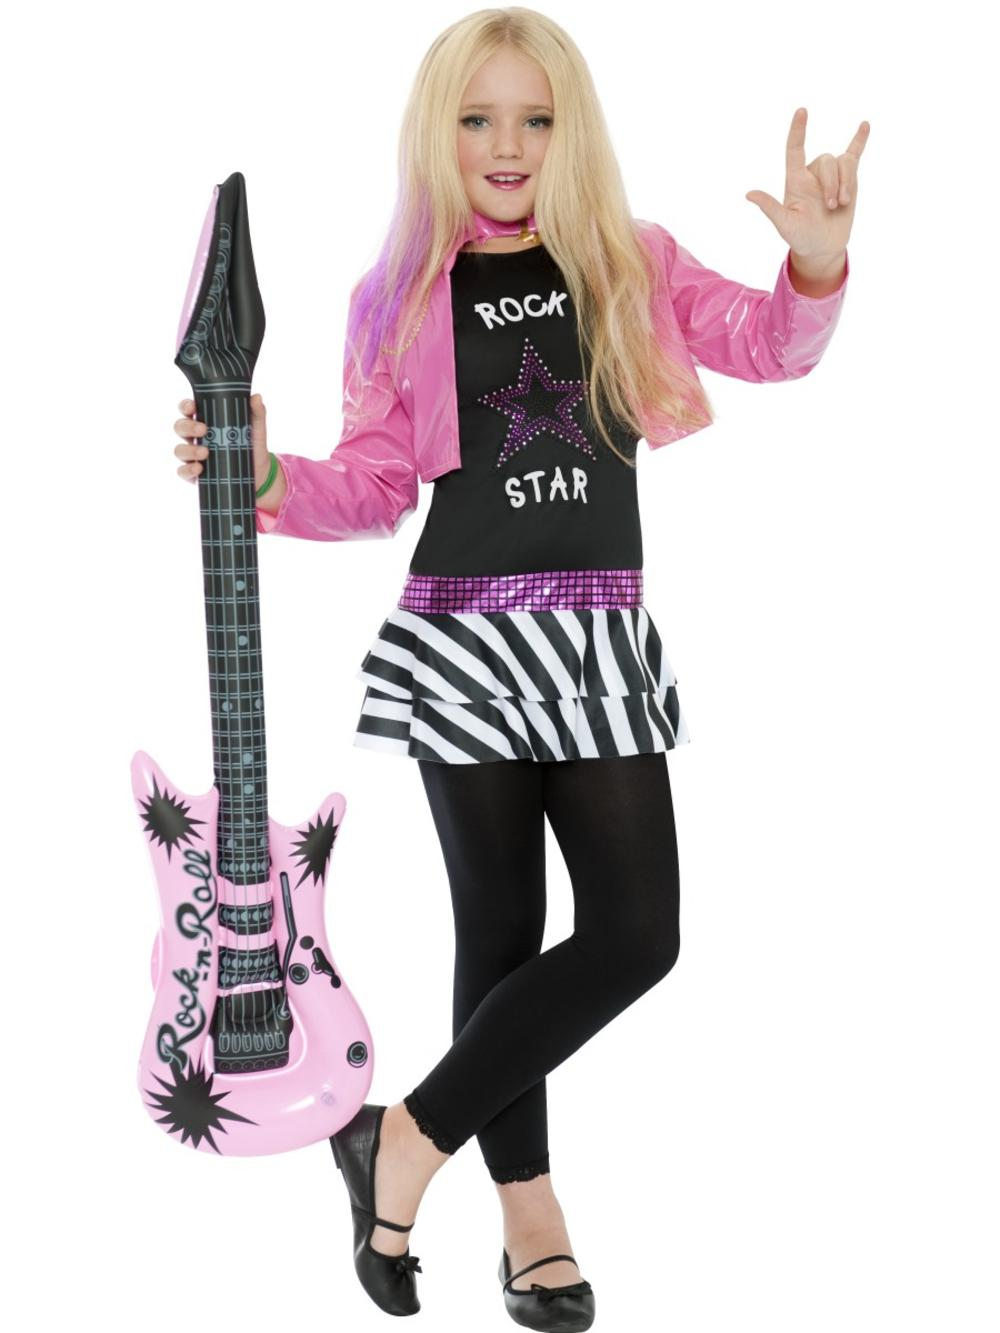 Rockstar Glam Girls Fancy Dress Celebrity Music Band Childrens Kids Costume New